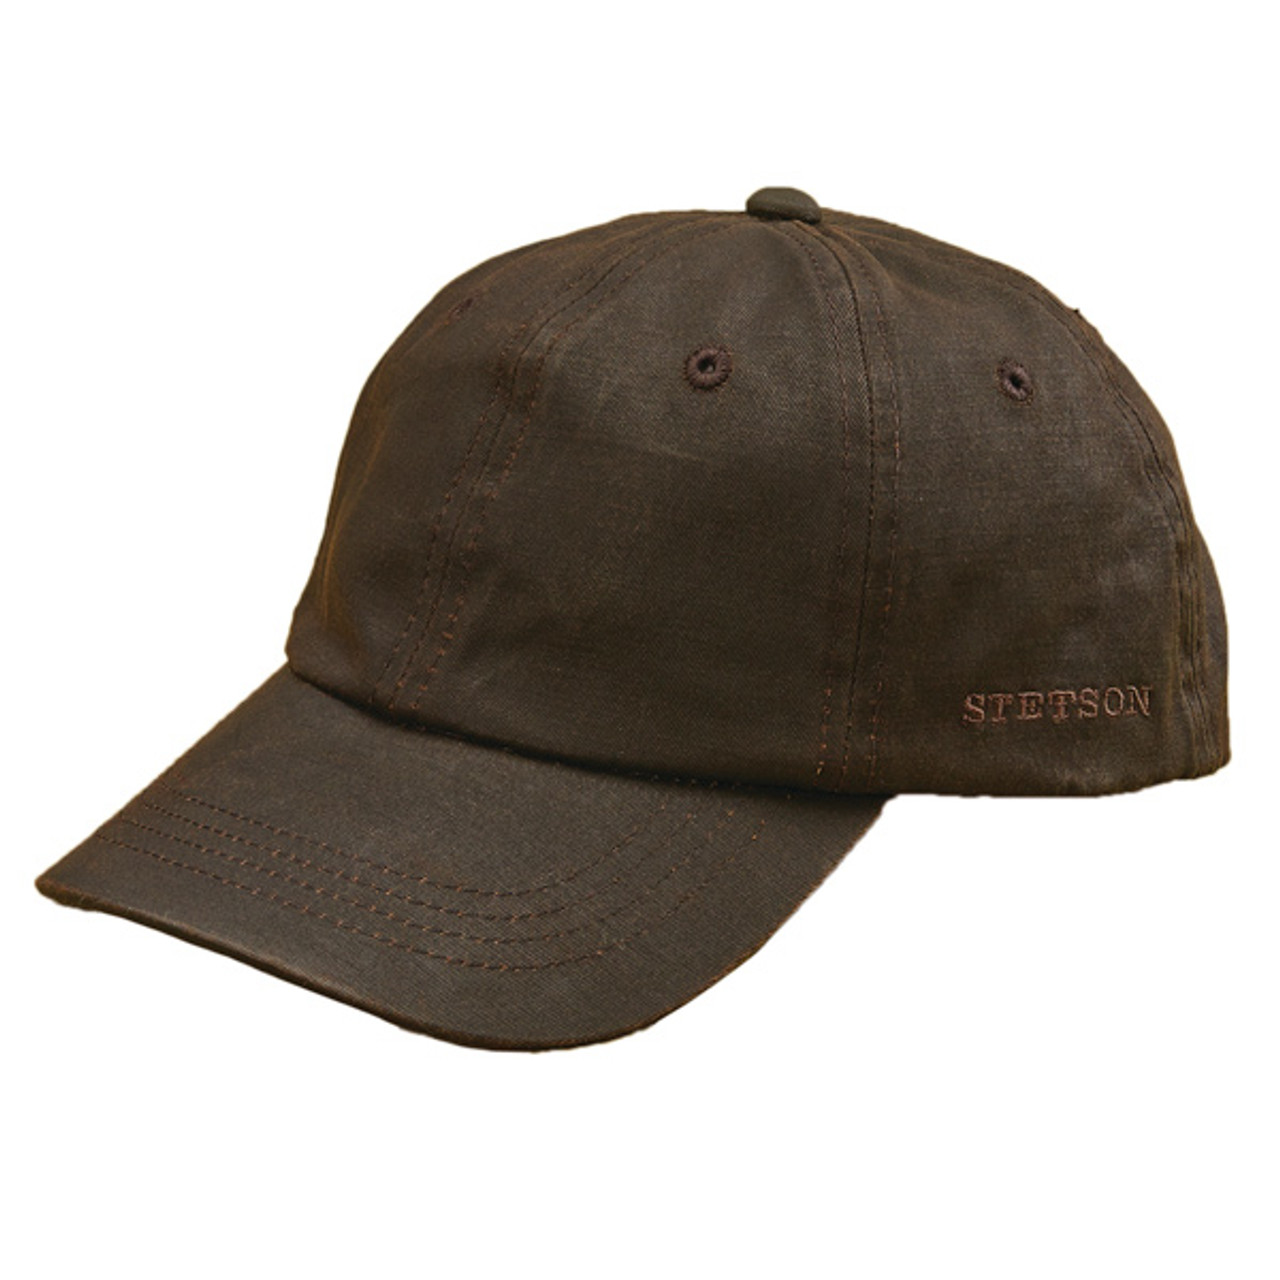 3750c6629 Stetson - Distressed Cotton Baseball Cap